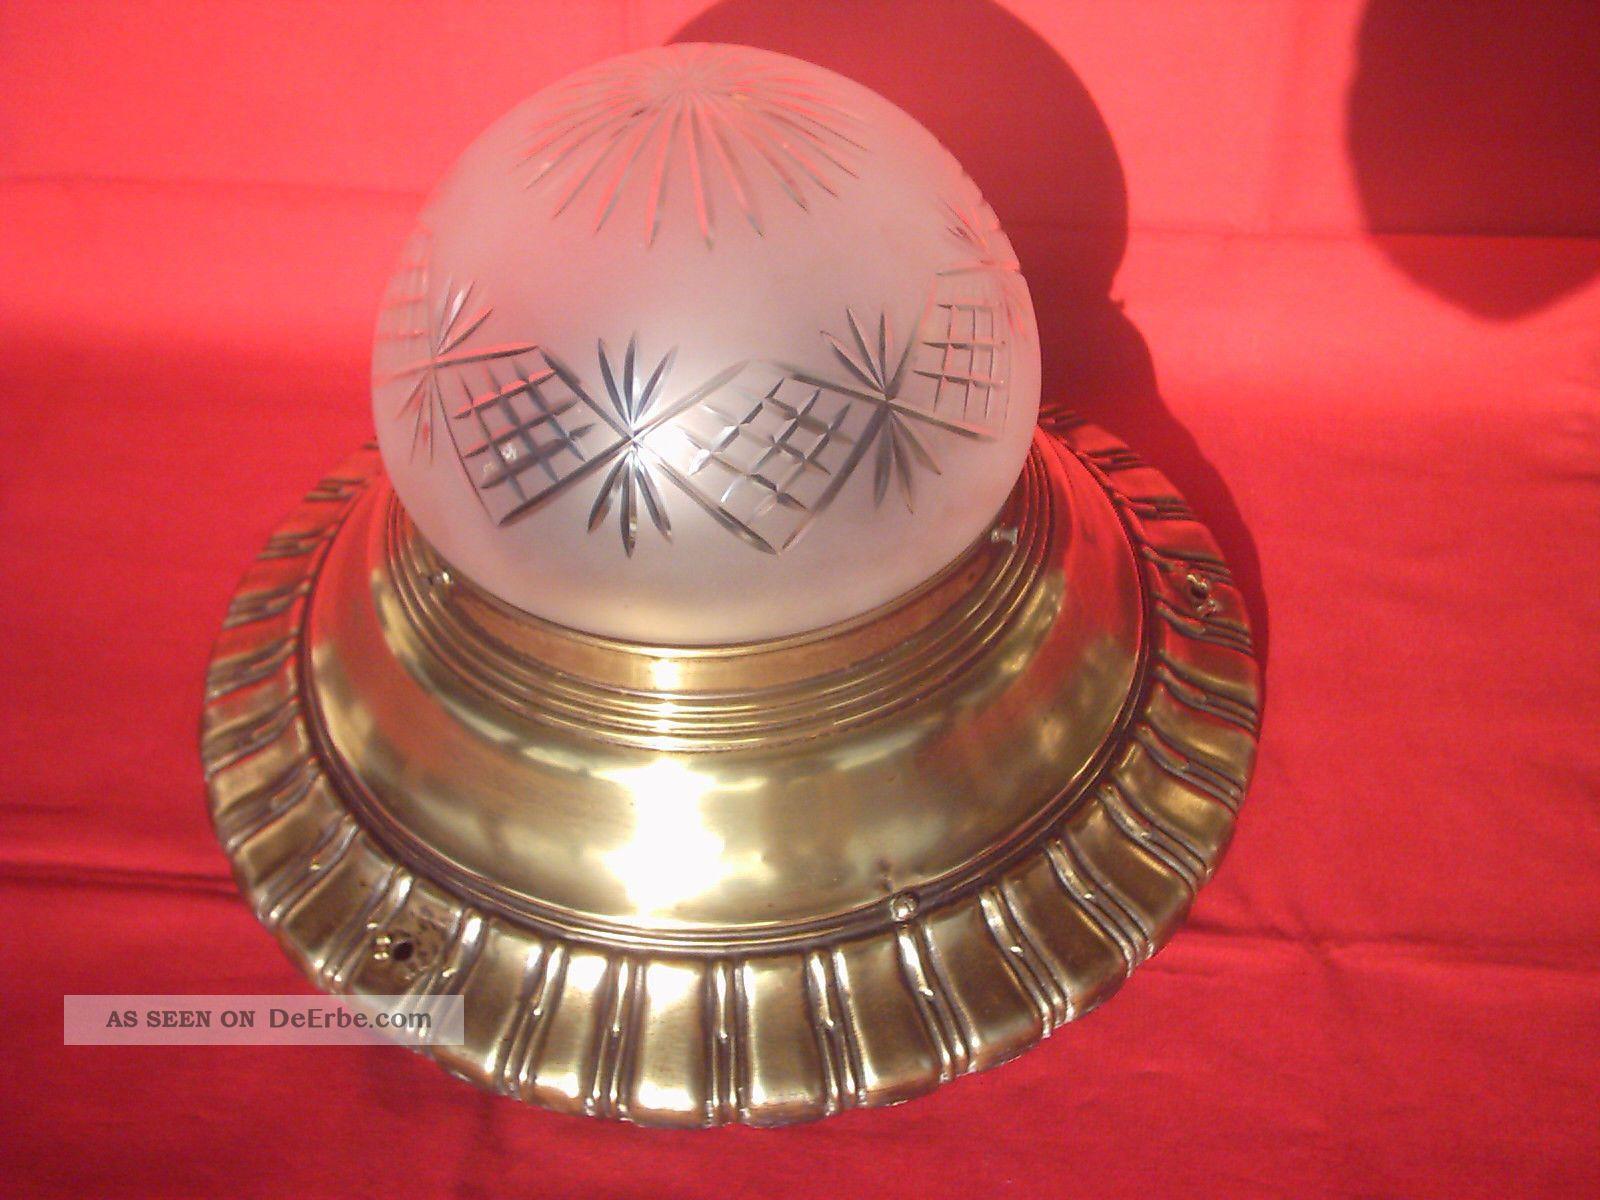 Deckenlampe Jugendstil Plafoniere : Prunkvolle große originale jugendstillampe plafoniere lampe